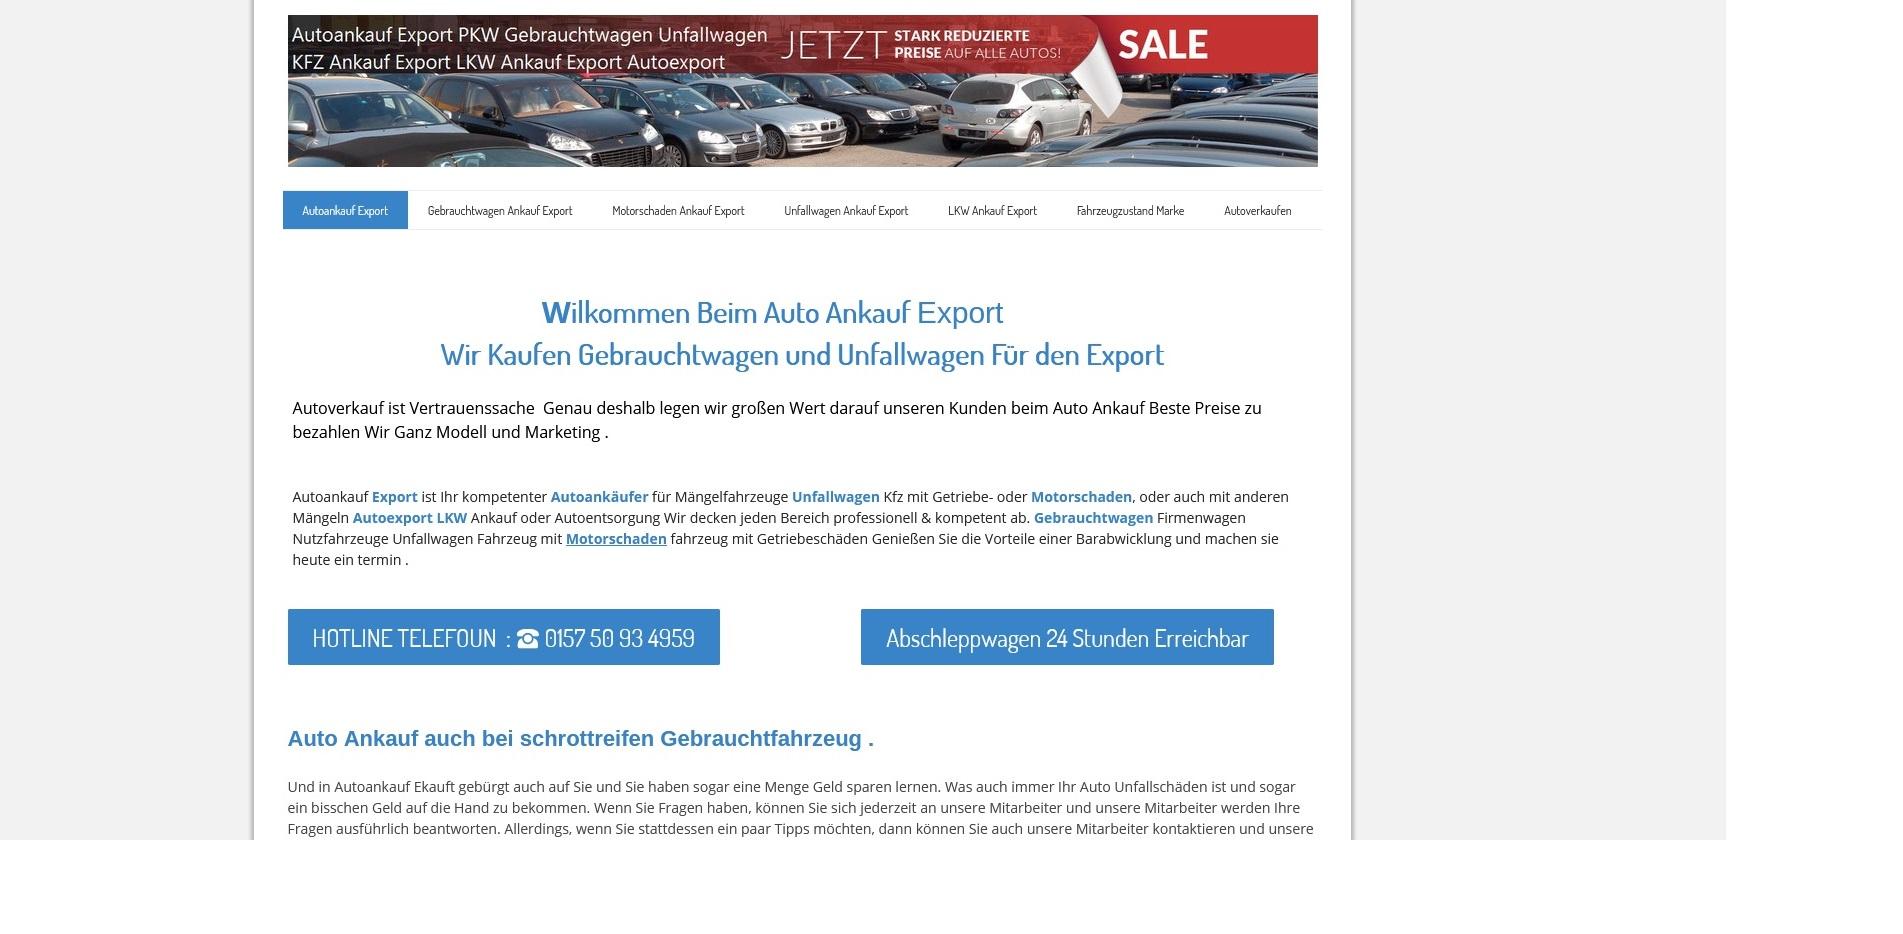 Kfz-Ankauf-export.de | Autoankauf Wiesbaden | Autoankauf Export Wiesbaden